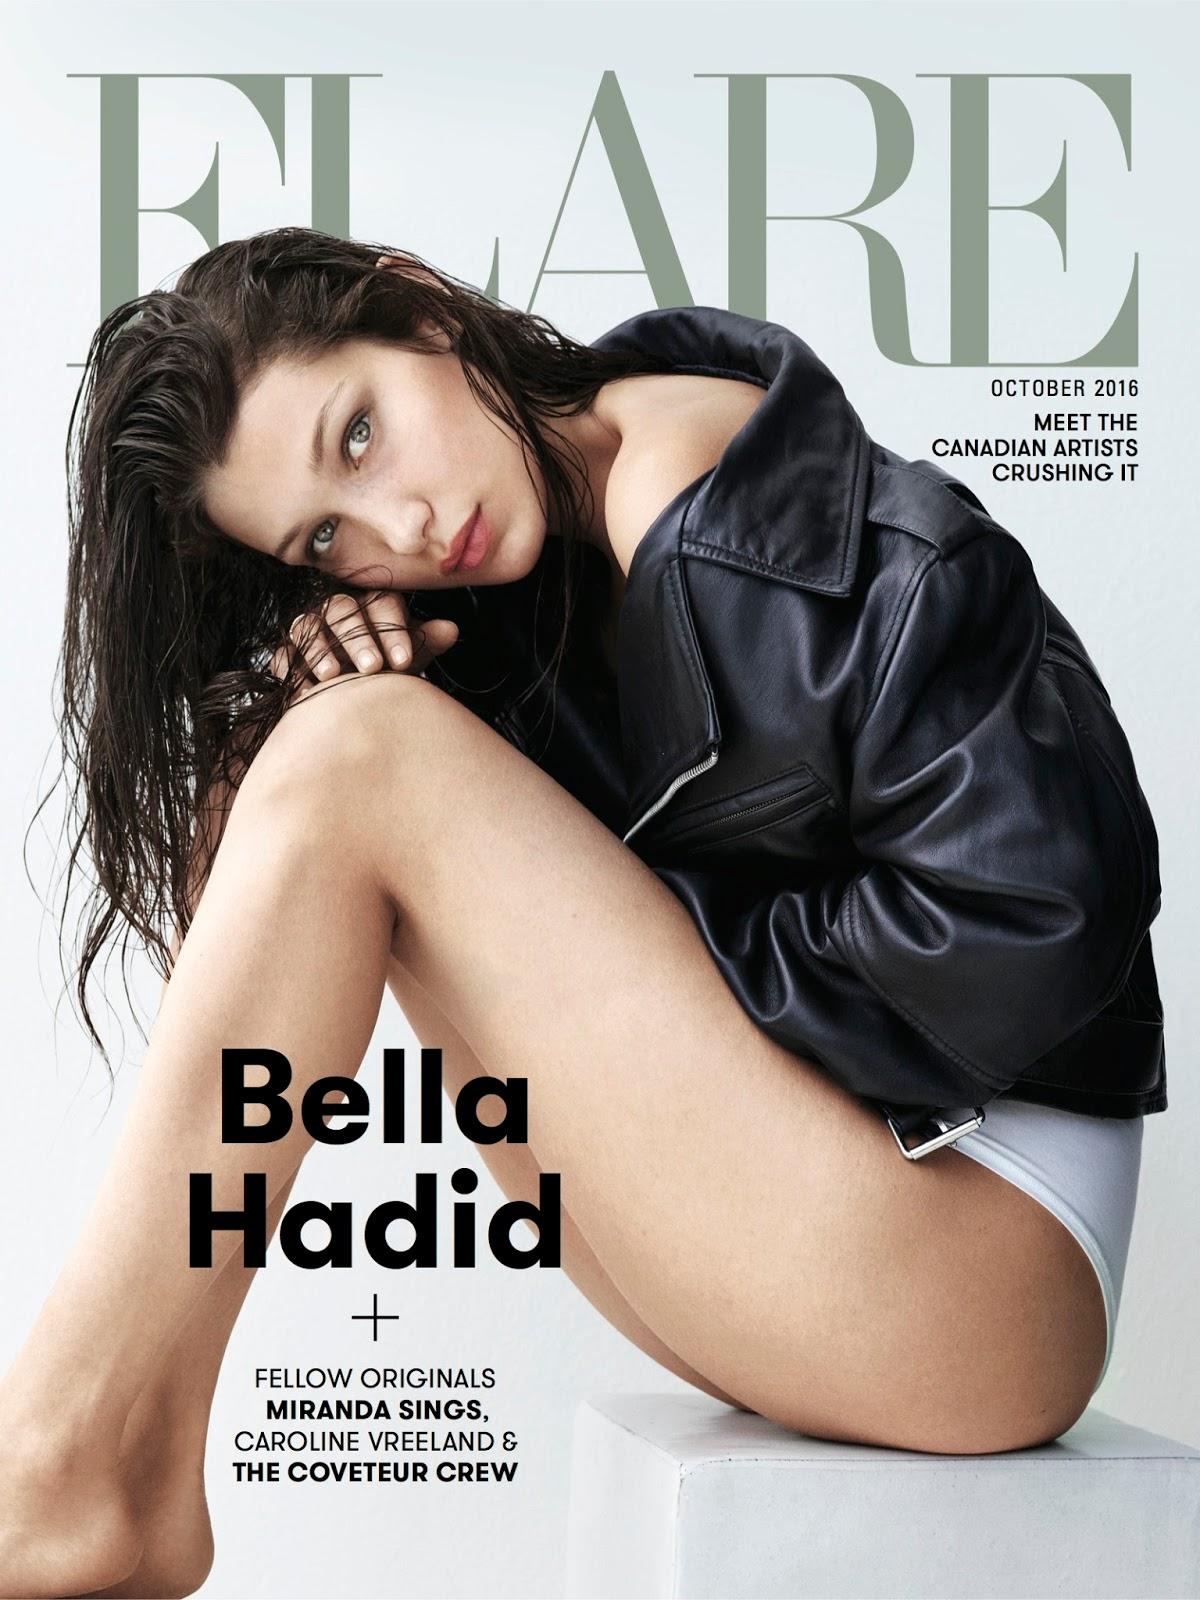 FLARE magazine October 2016 Bella Hadid